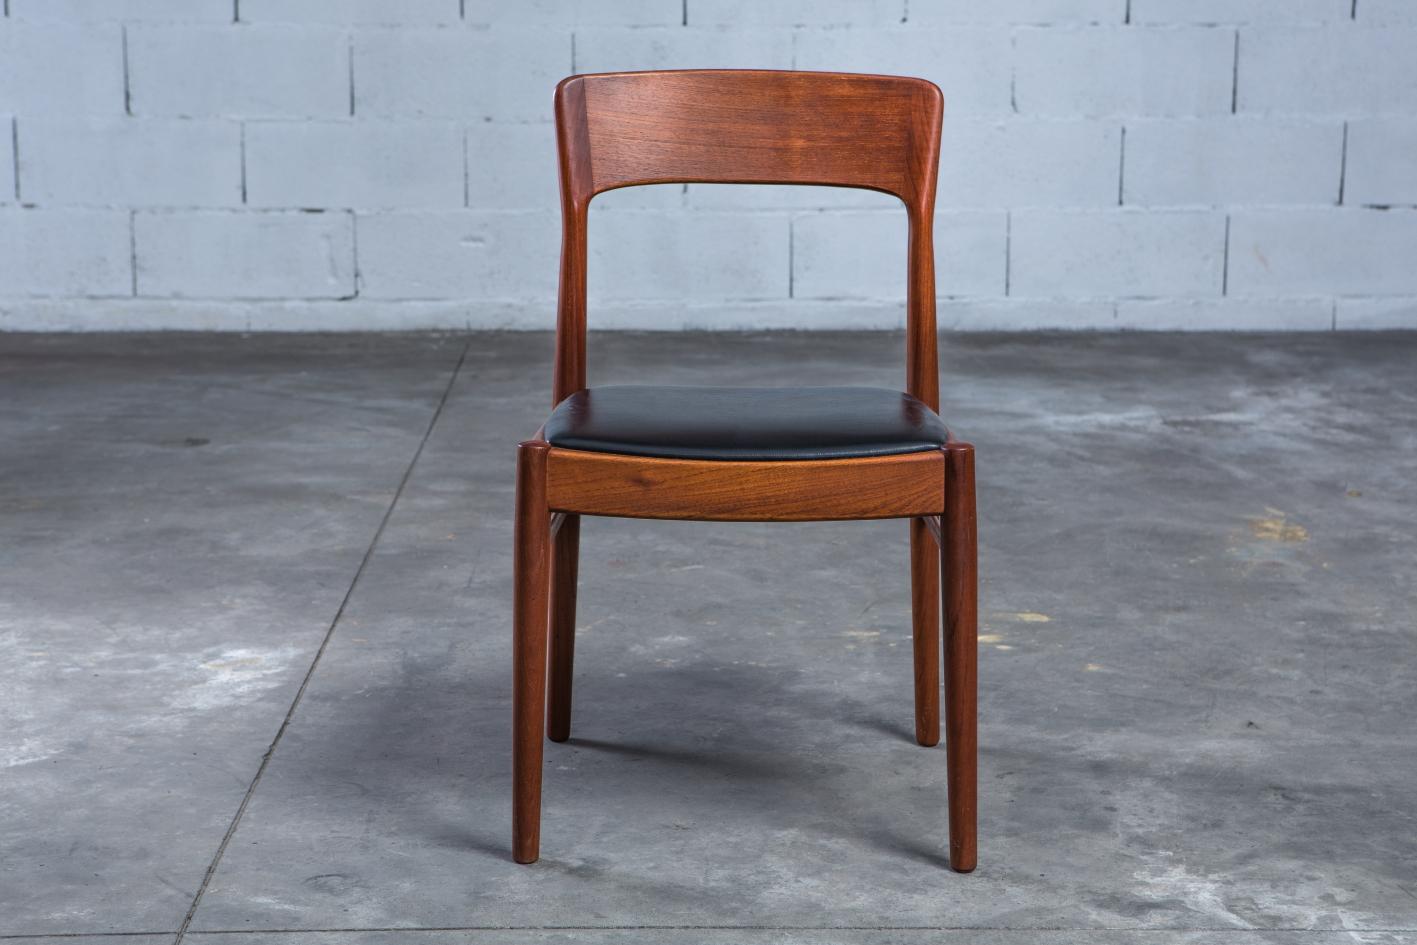 mid century teak danish chairs - Korup Stolefabrik - Front view